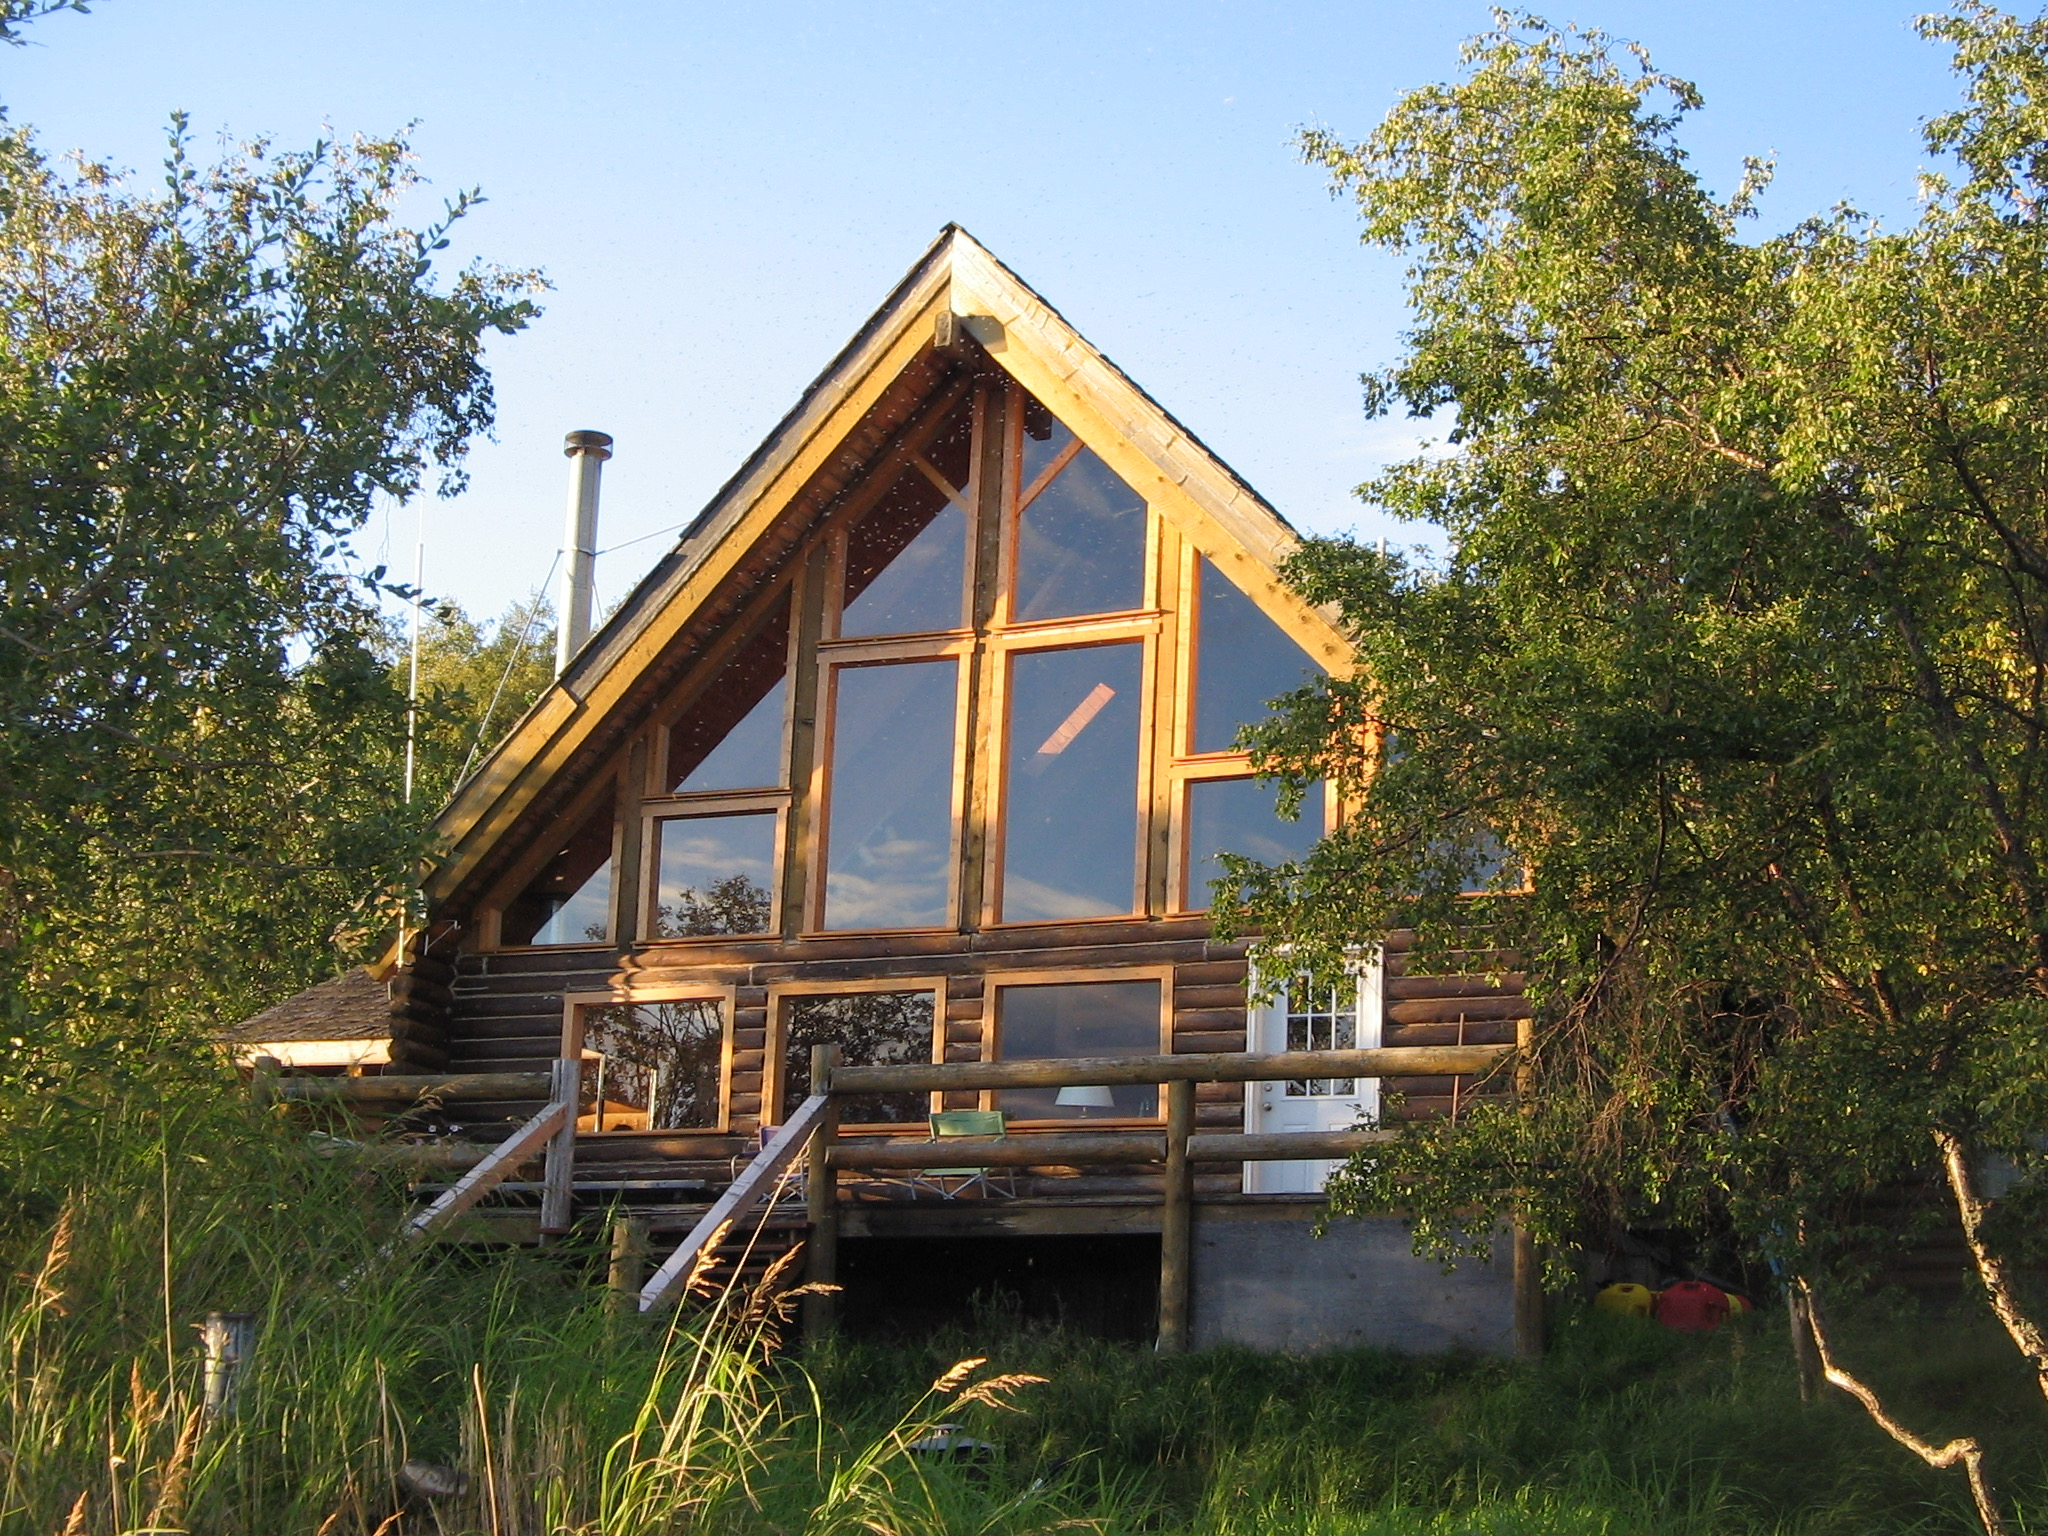 Alaska Fishing Adventures cabin